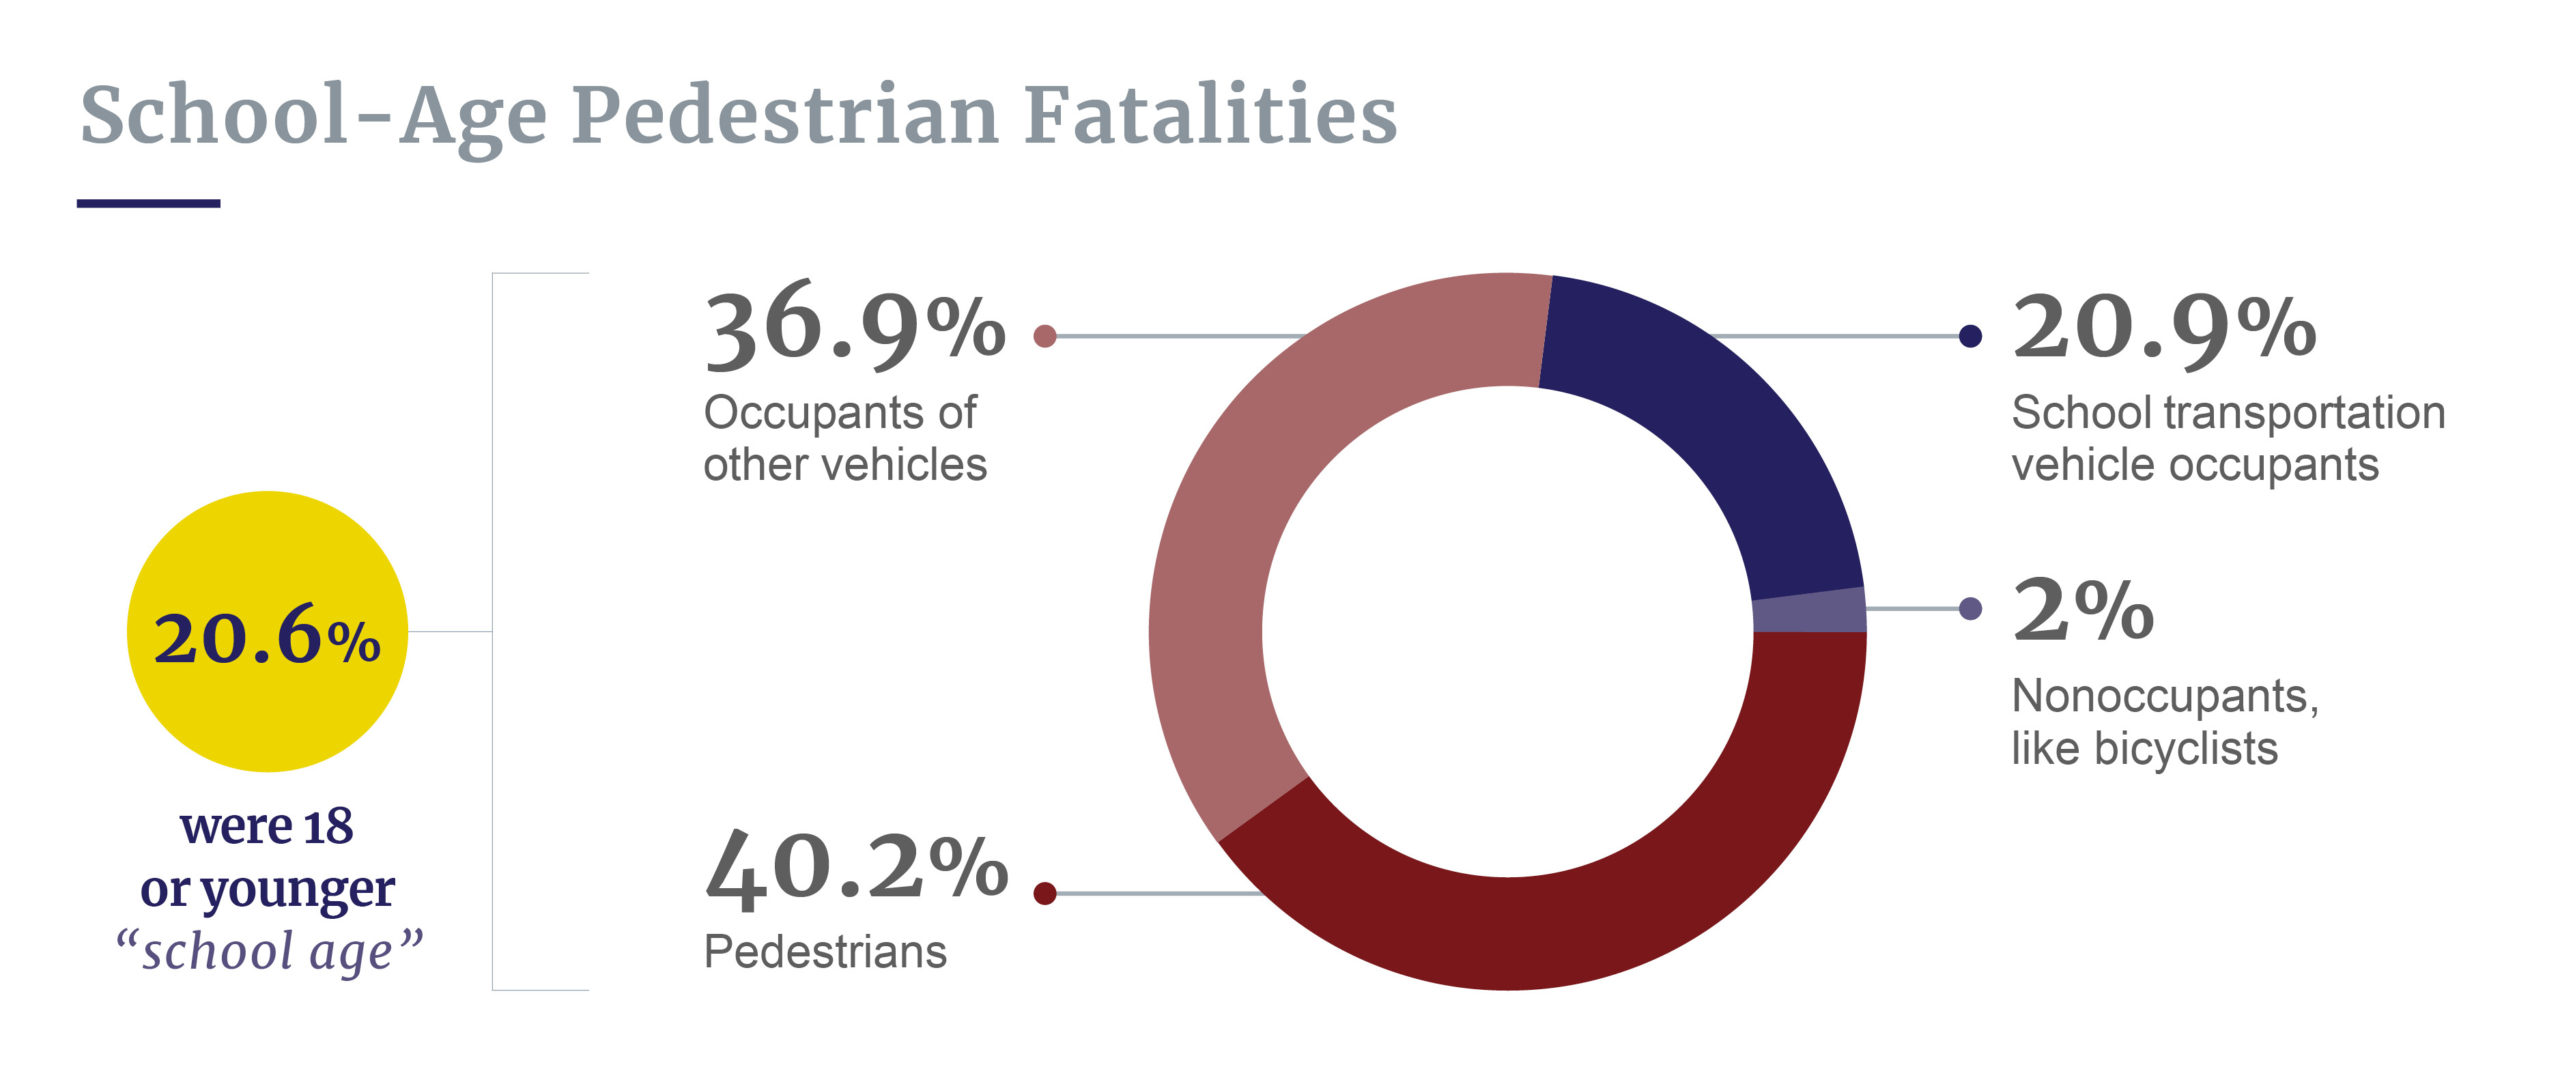 School-age pedestrian fatalities